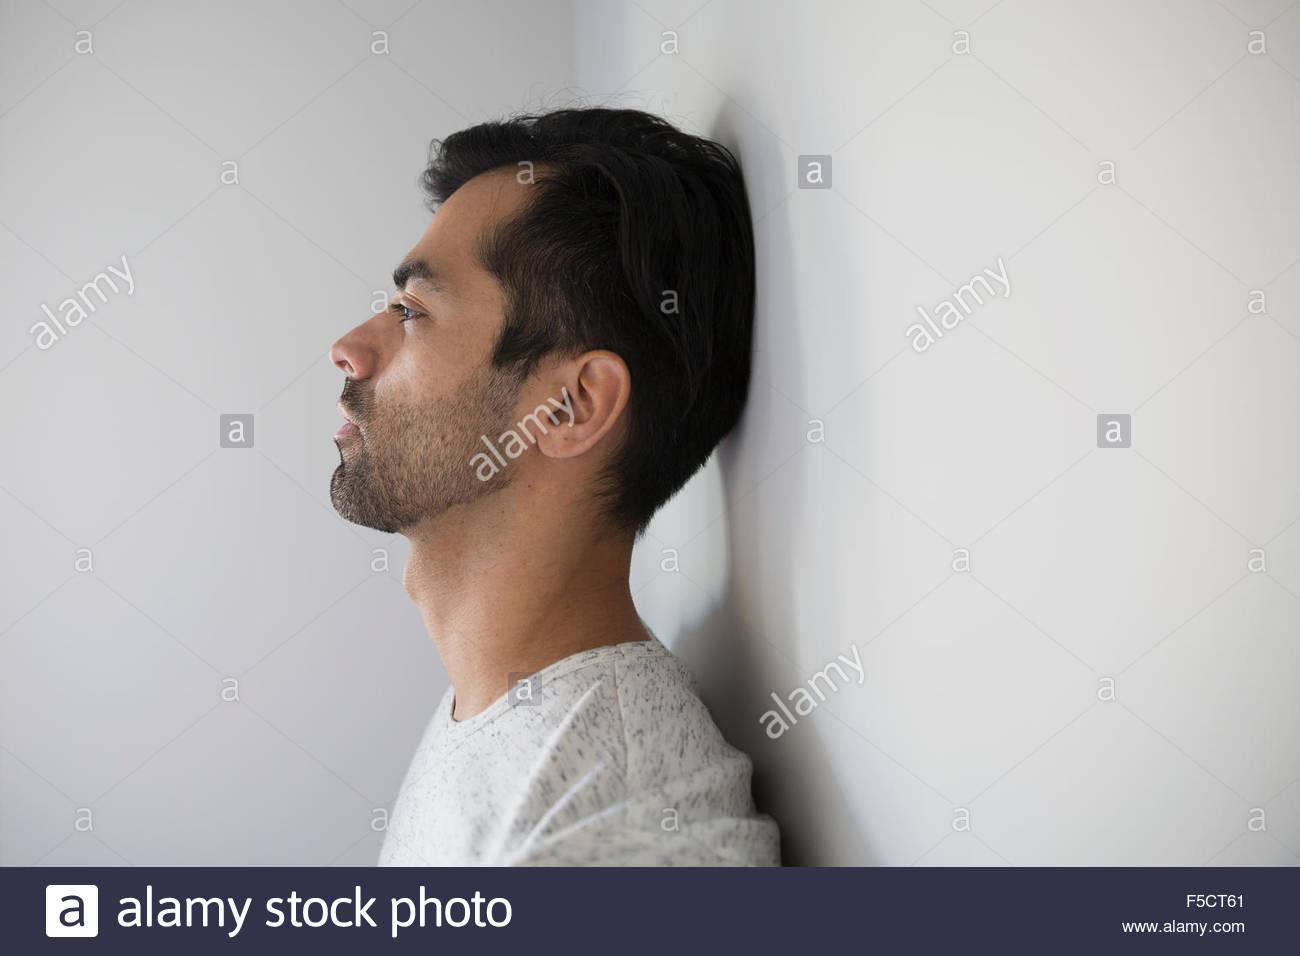 Profile of pensive man looking away - Stock Image